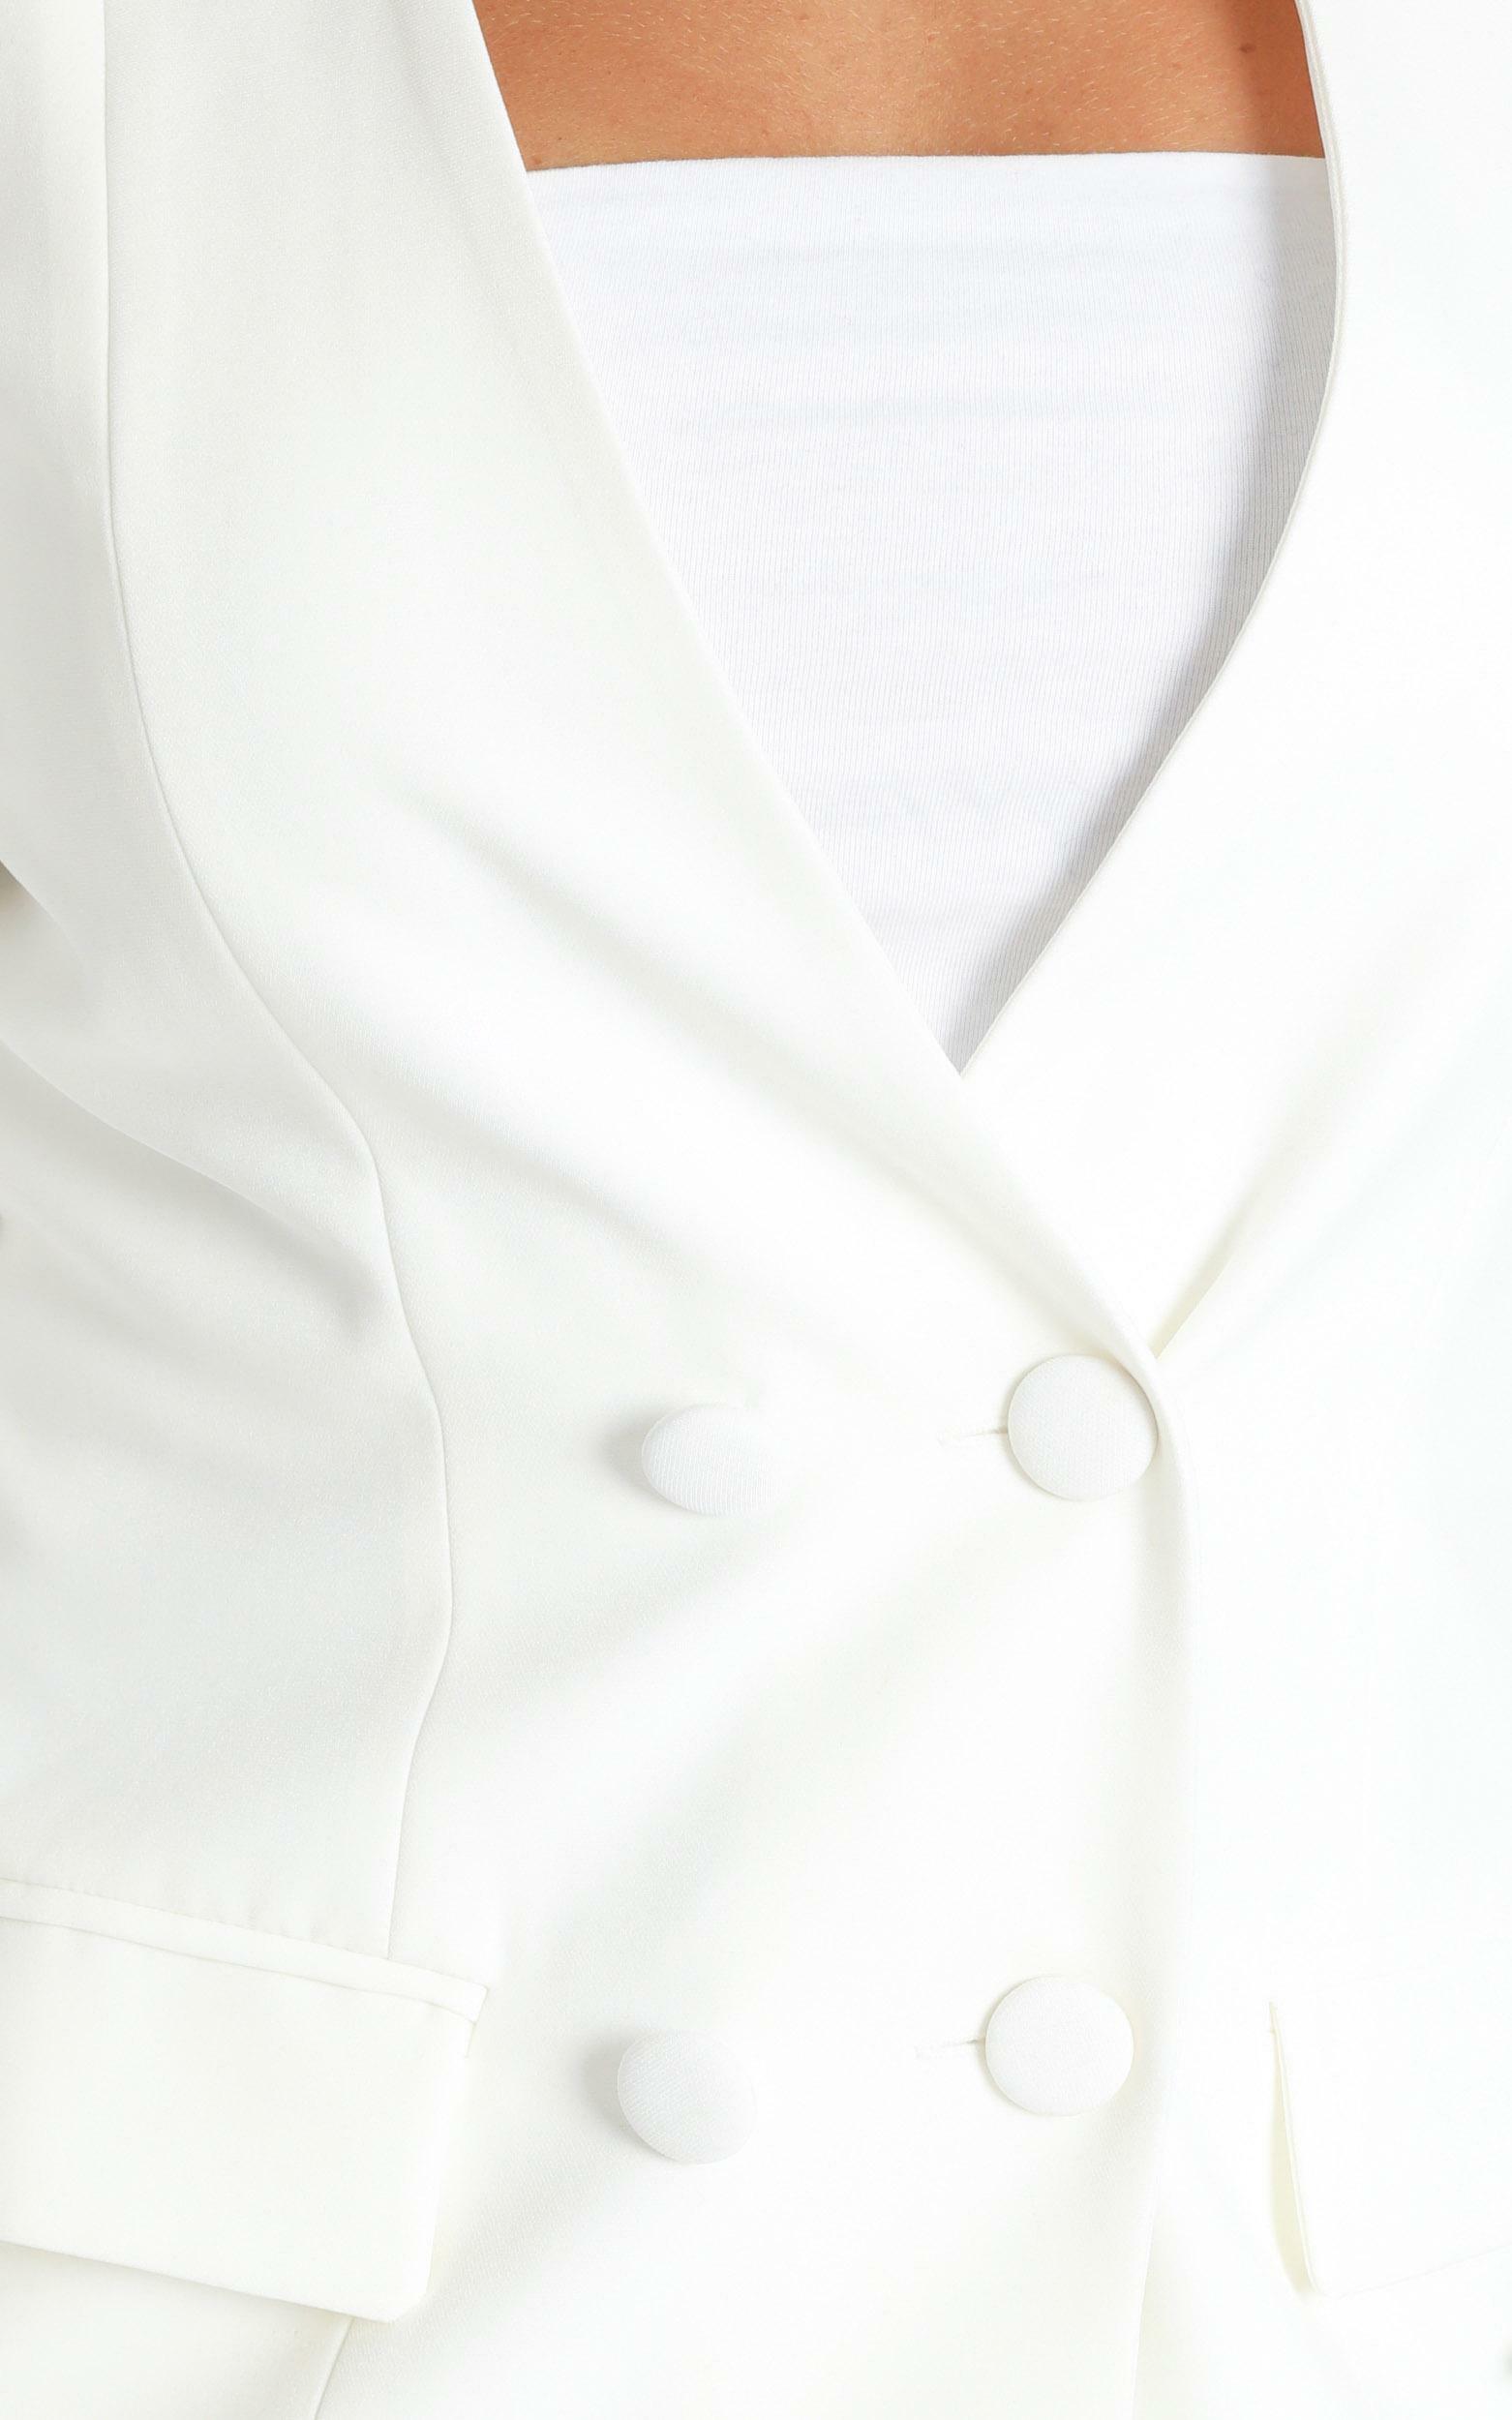 Running Thin Blazer in white - 14 (XL), White, hi-res image number null